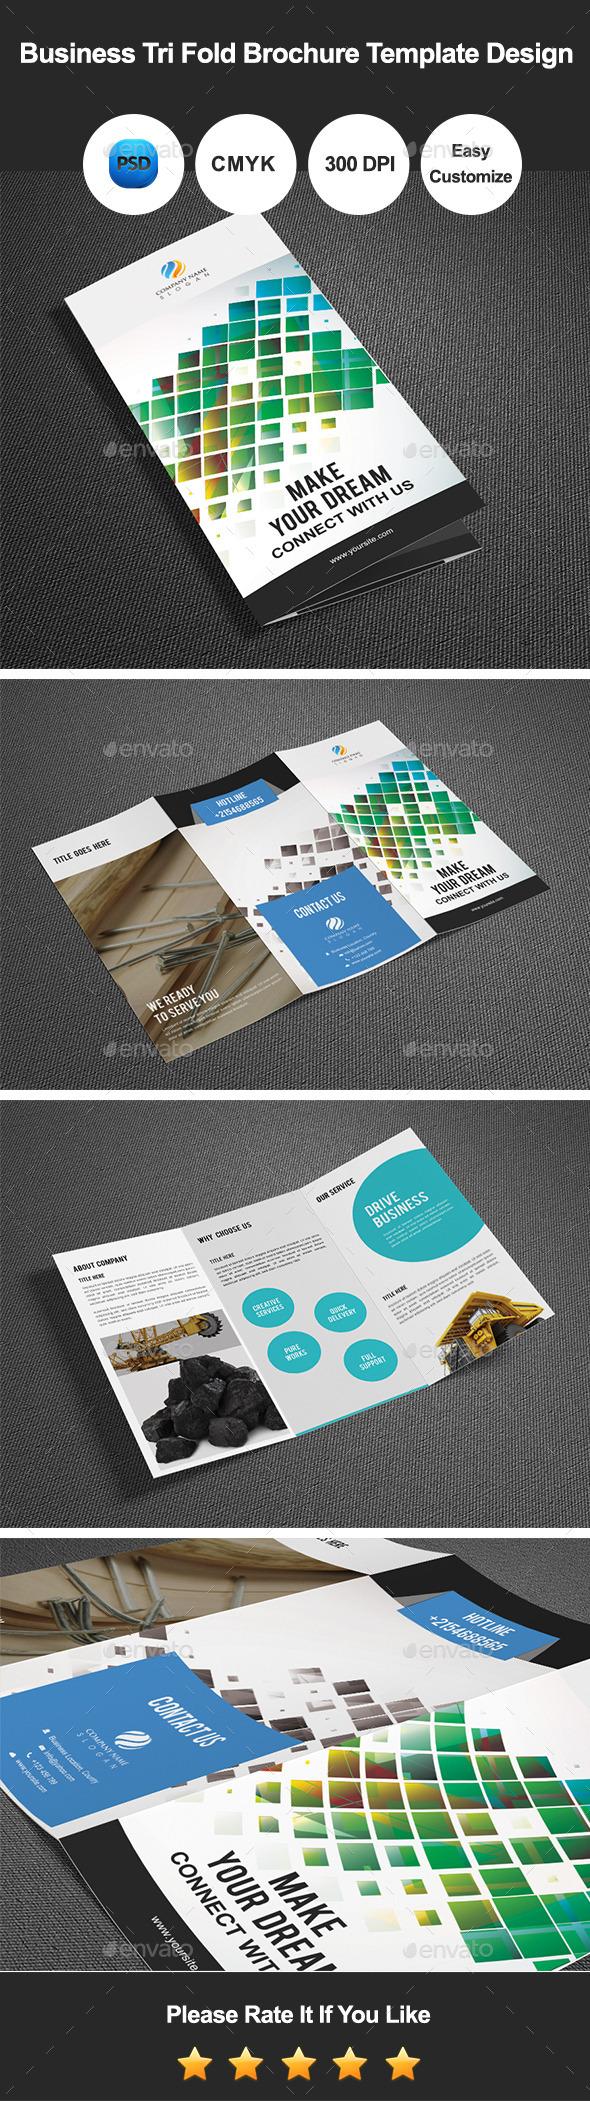 GraphicRiver Business Tri Fold Brochure Template Design 11843989